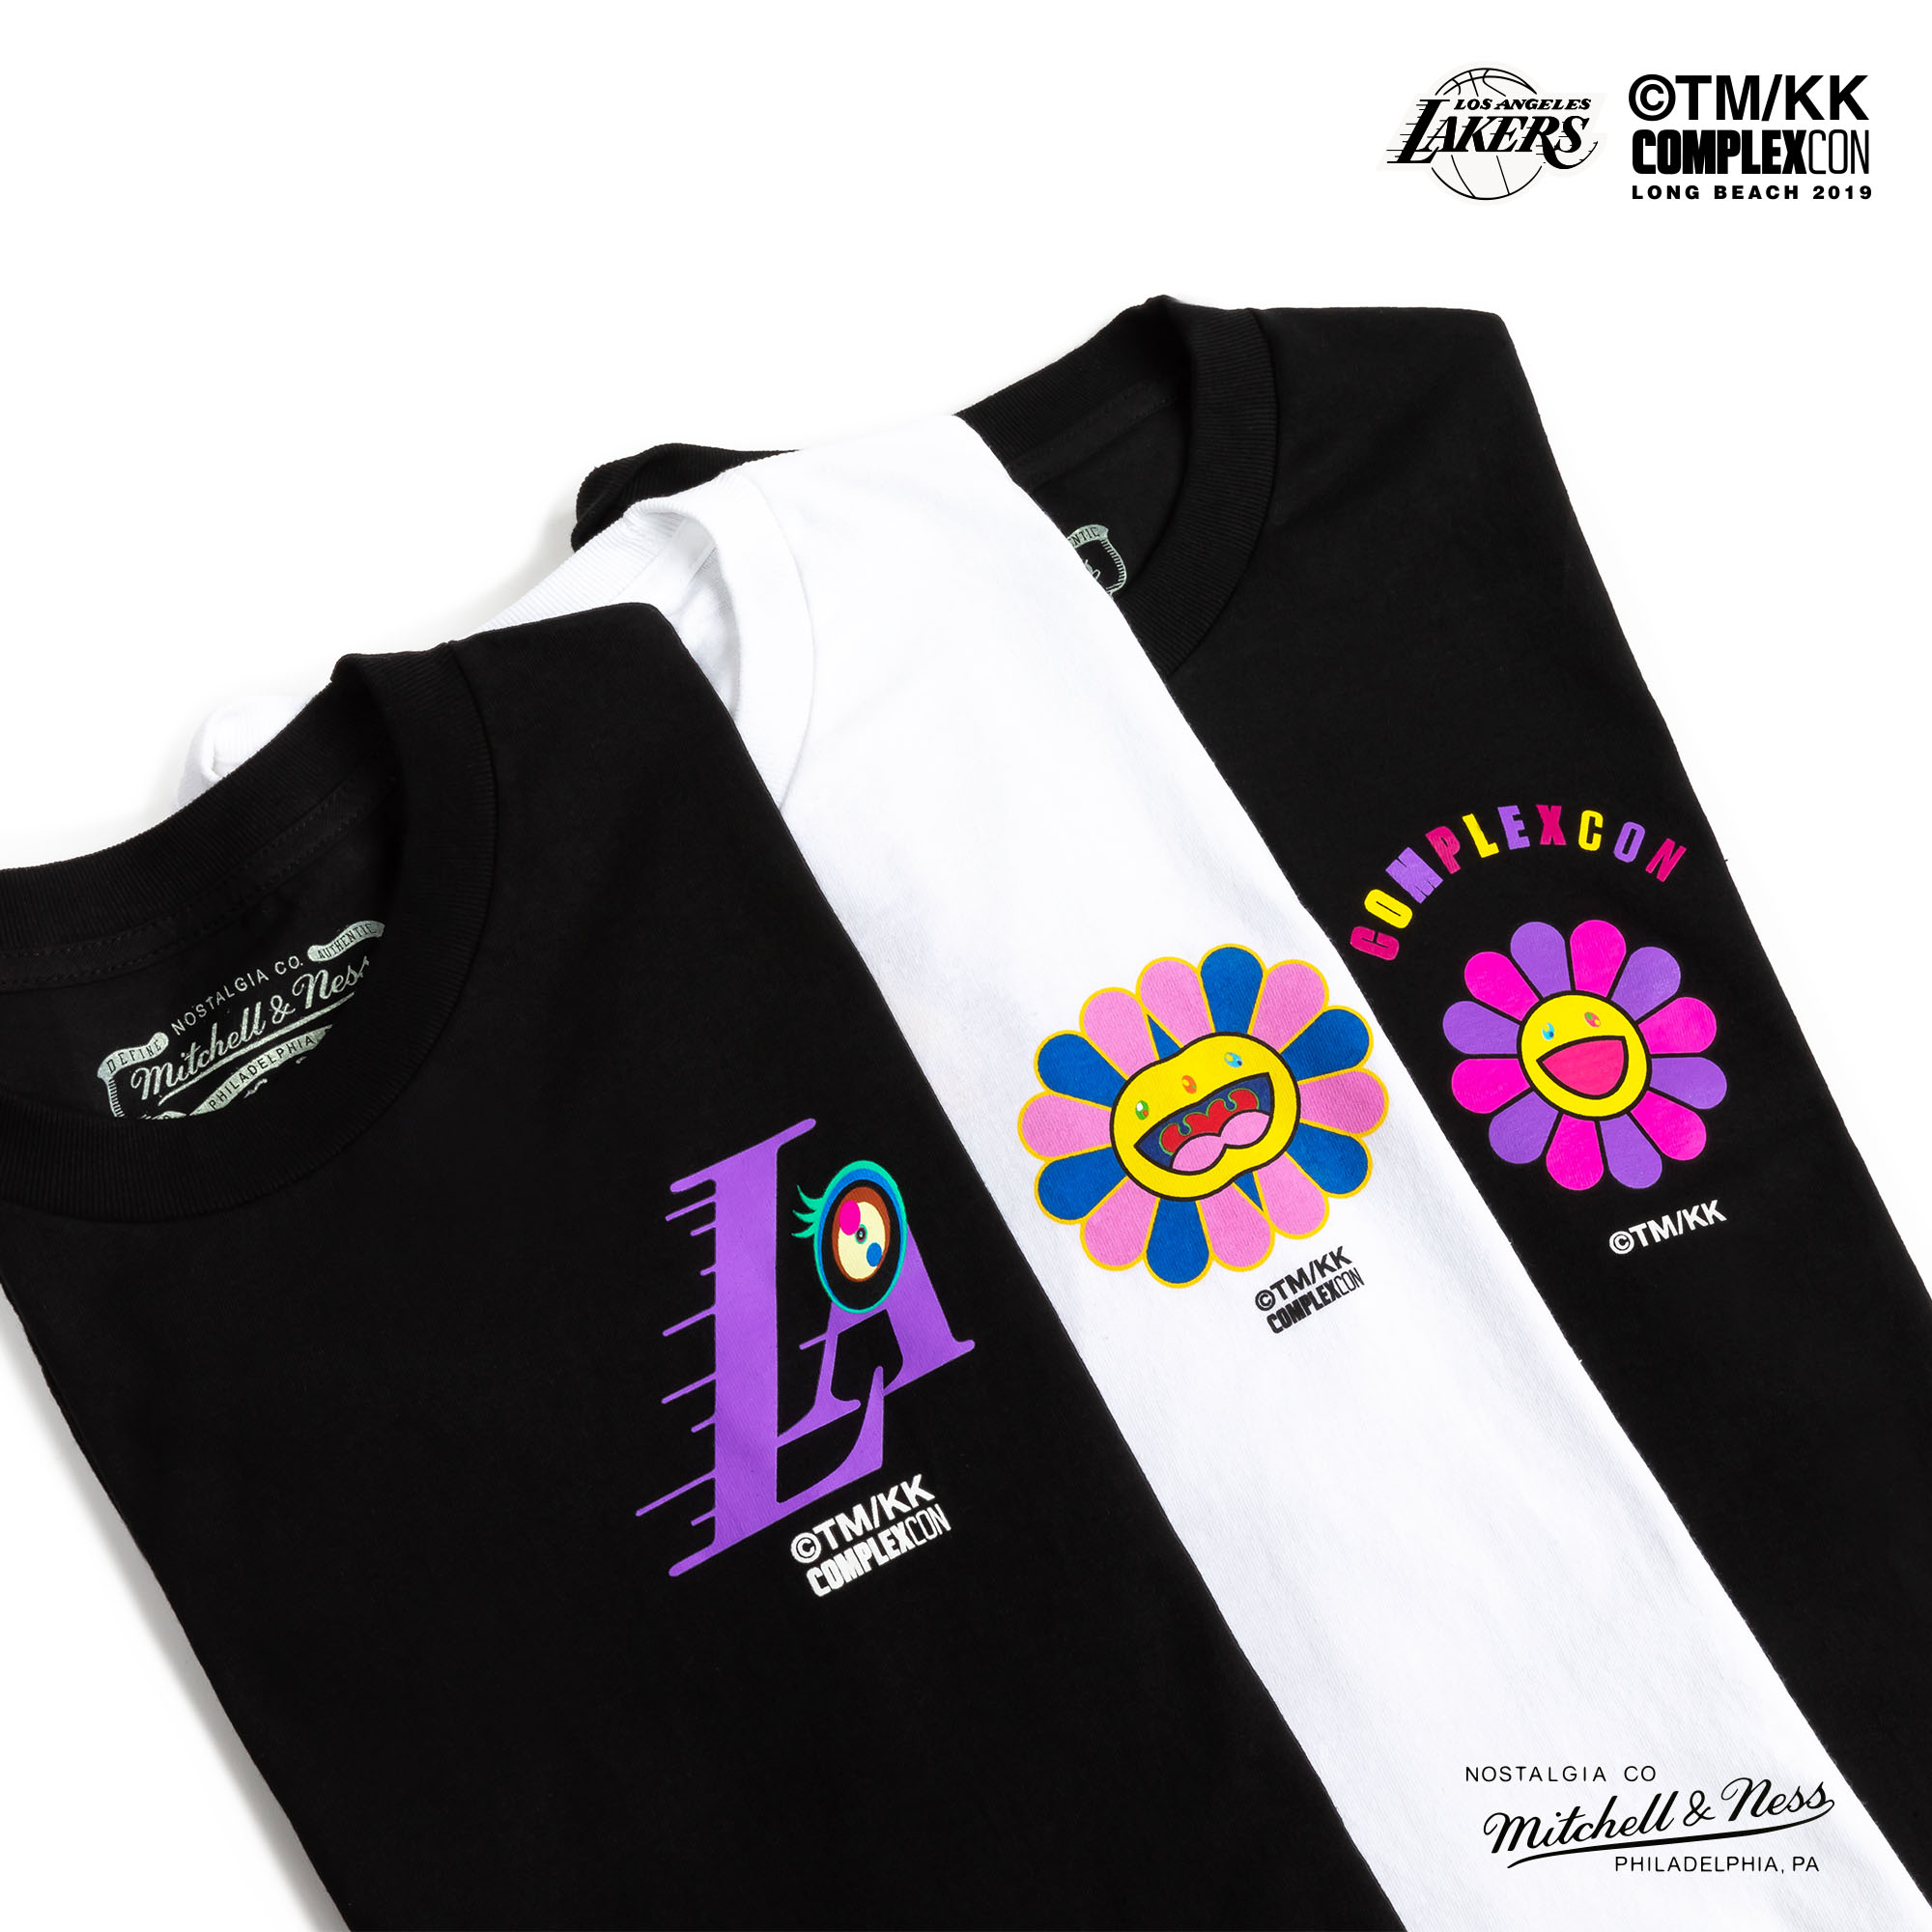 Complexcon Lakers Mitchell Ness Takashi Murukami T-Shirts